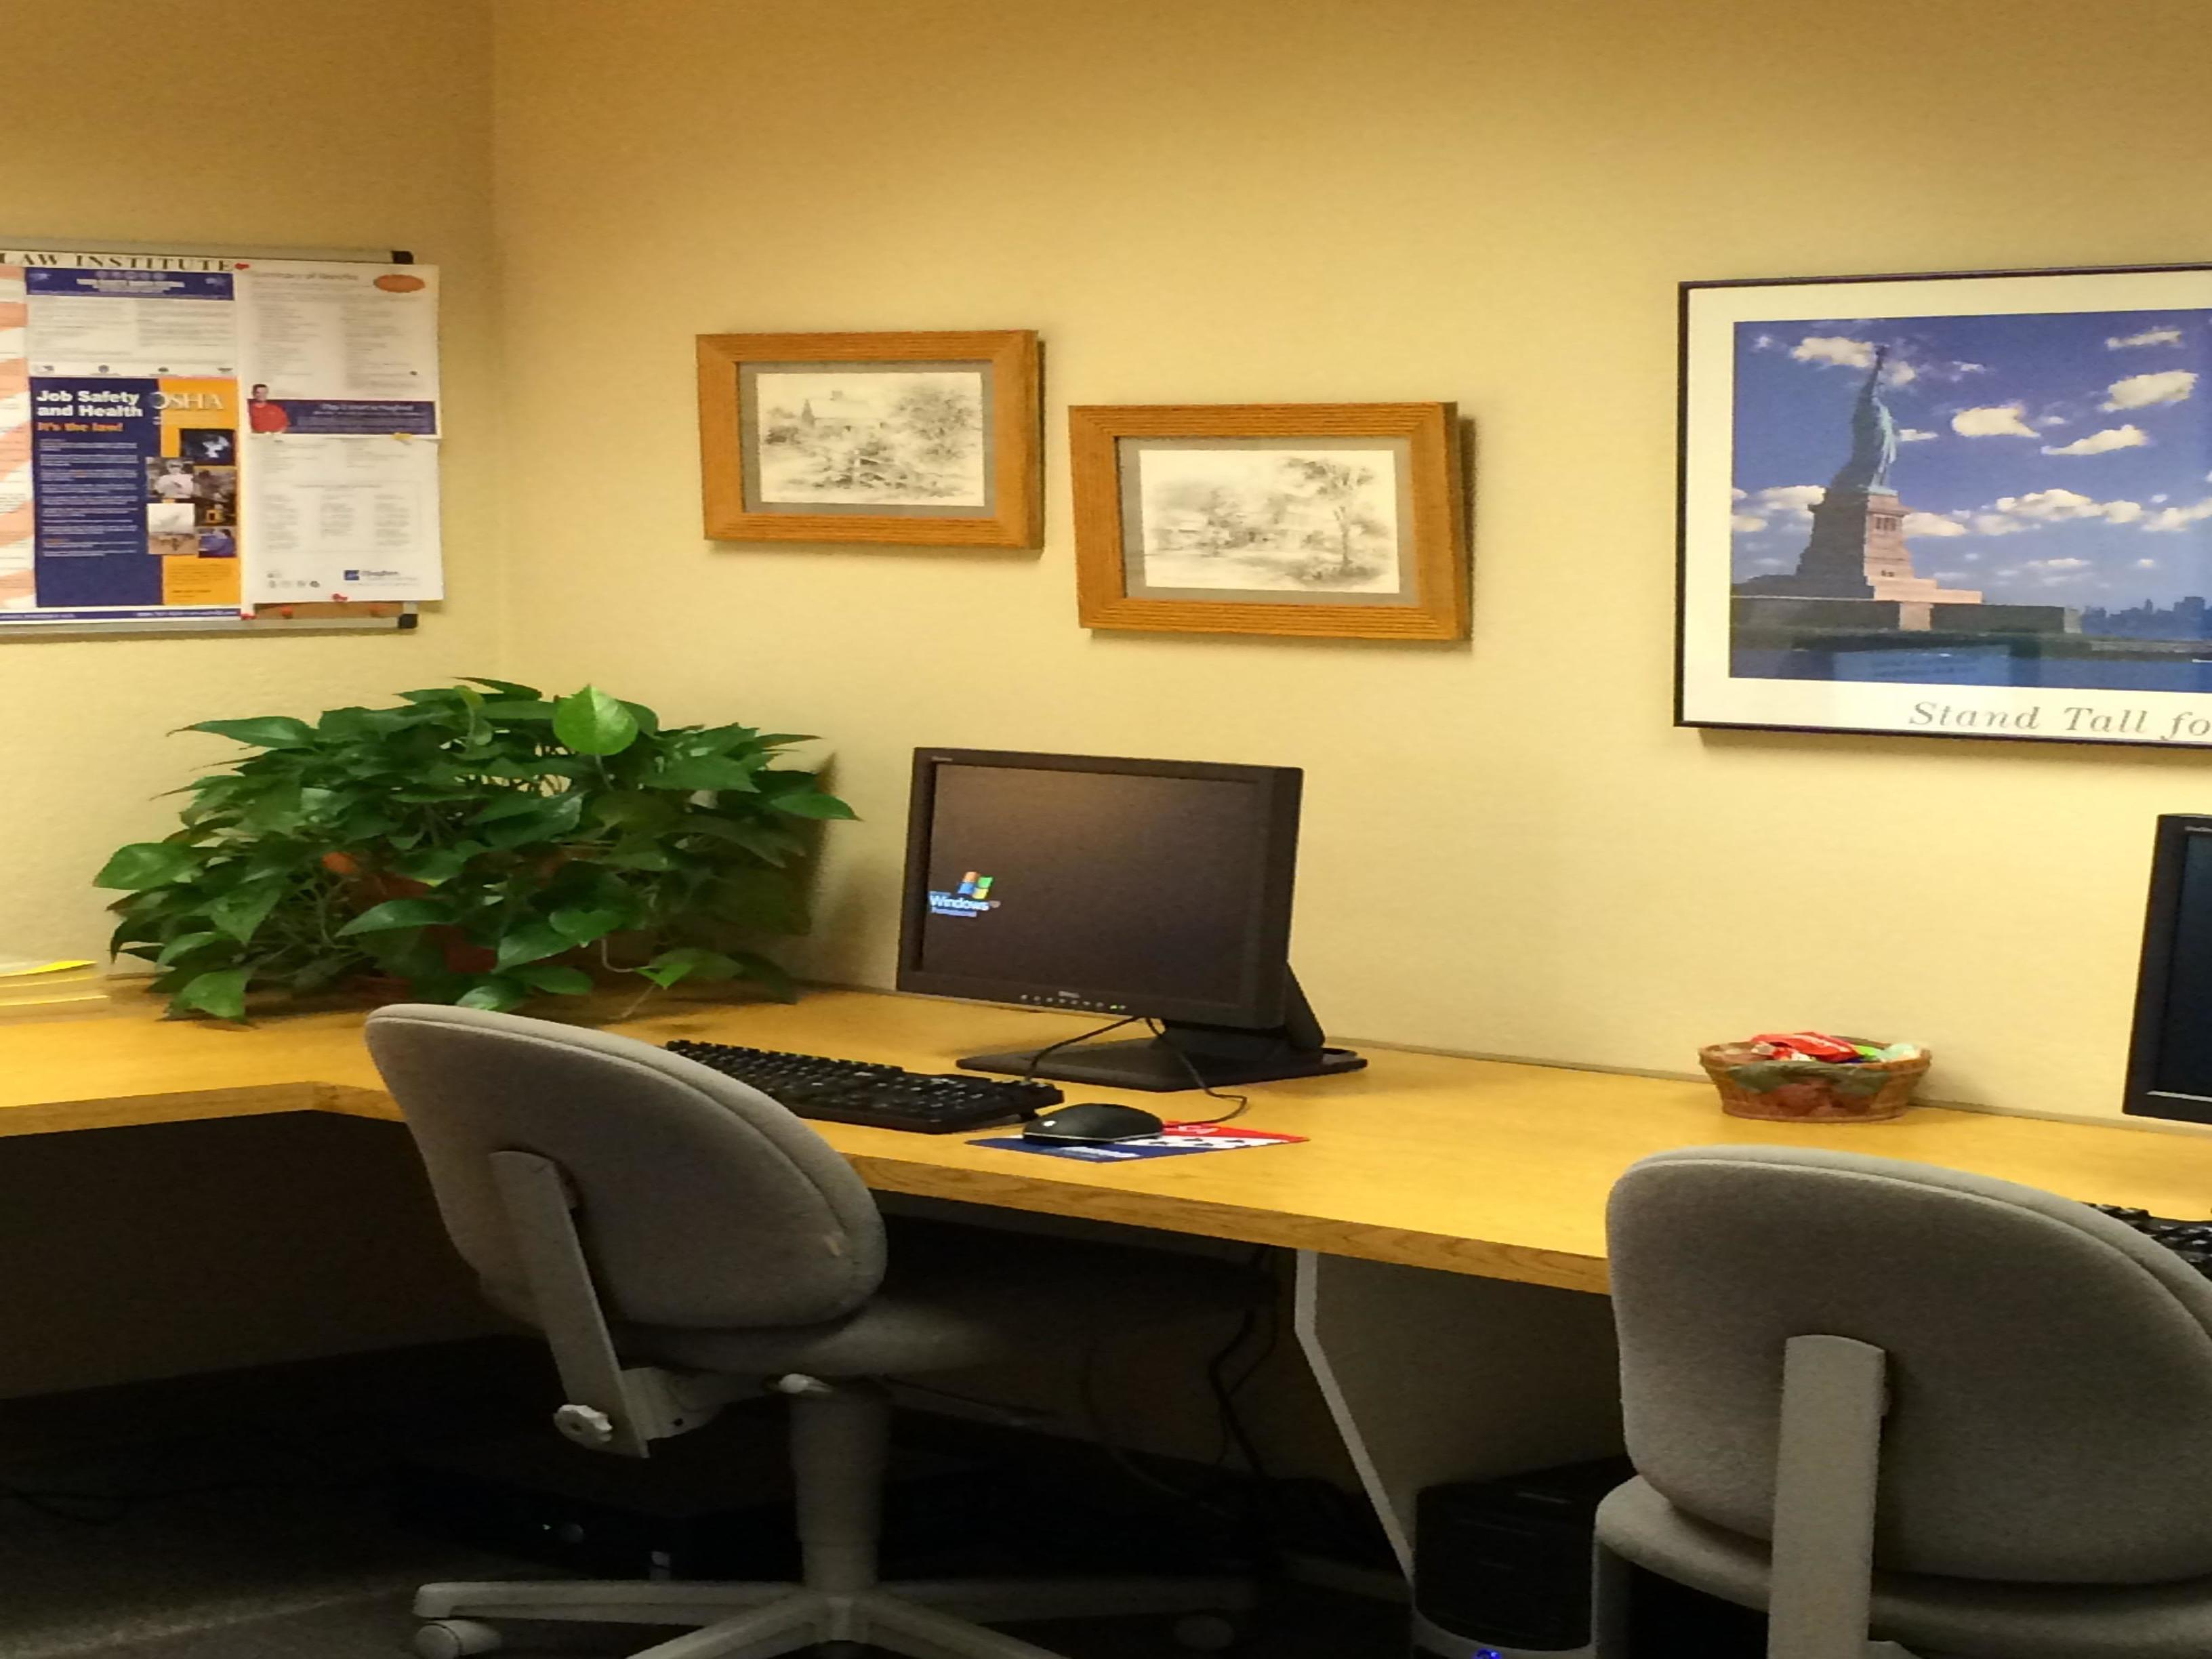 Remedy Intelligent Staffing 5055 E Broadway Blvd B103 Tucson, AZ Employment  Contractors Temporary Help   MapQuest